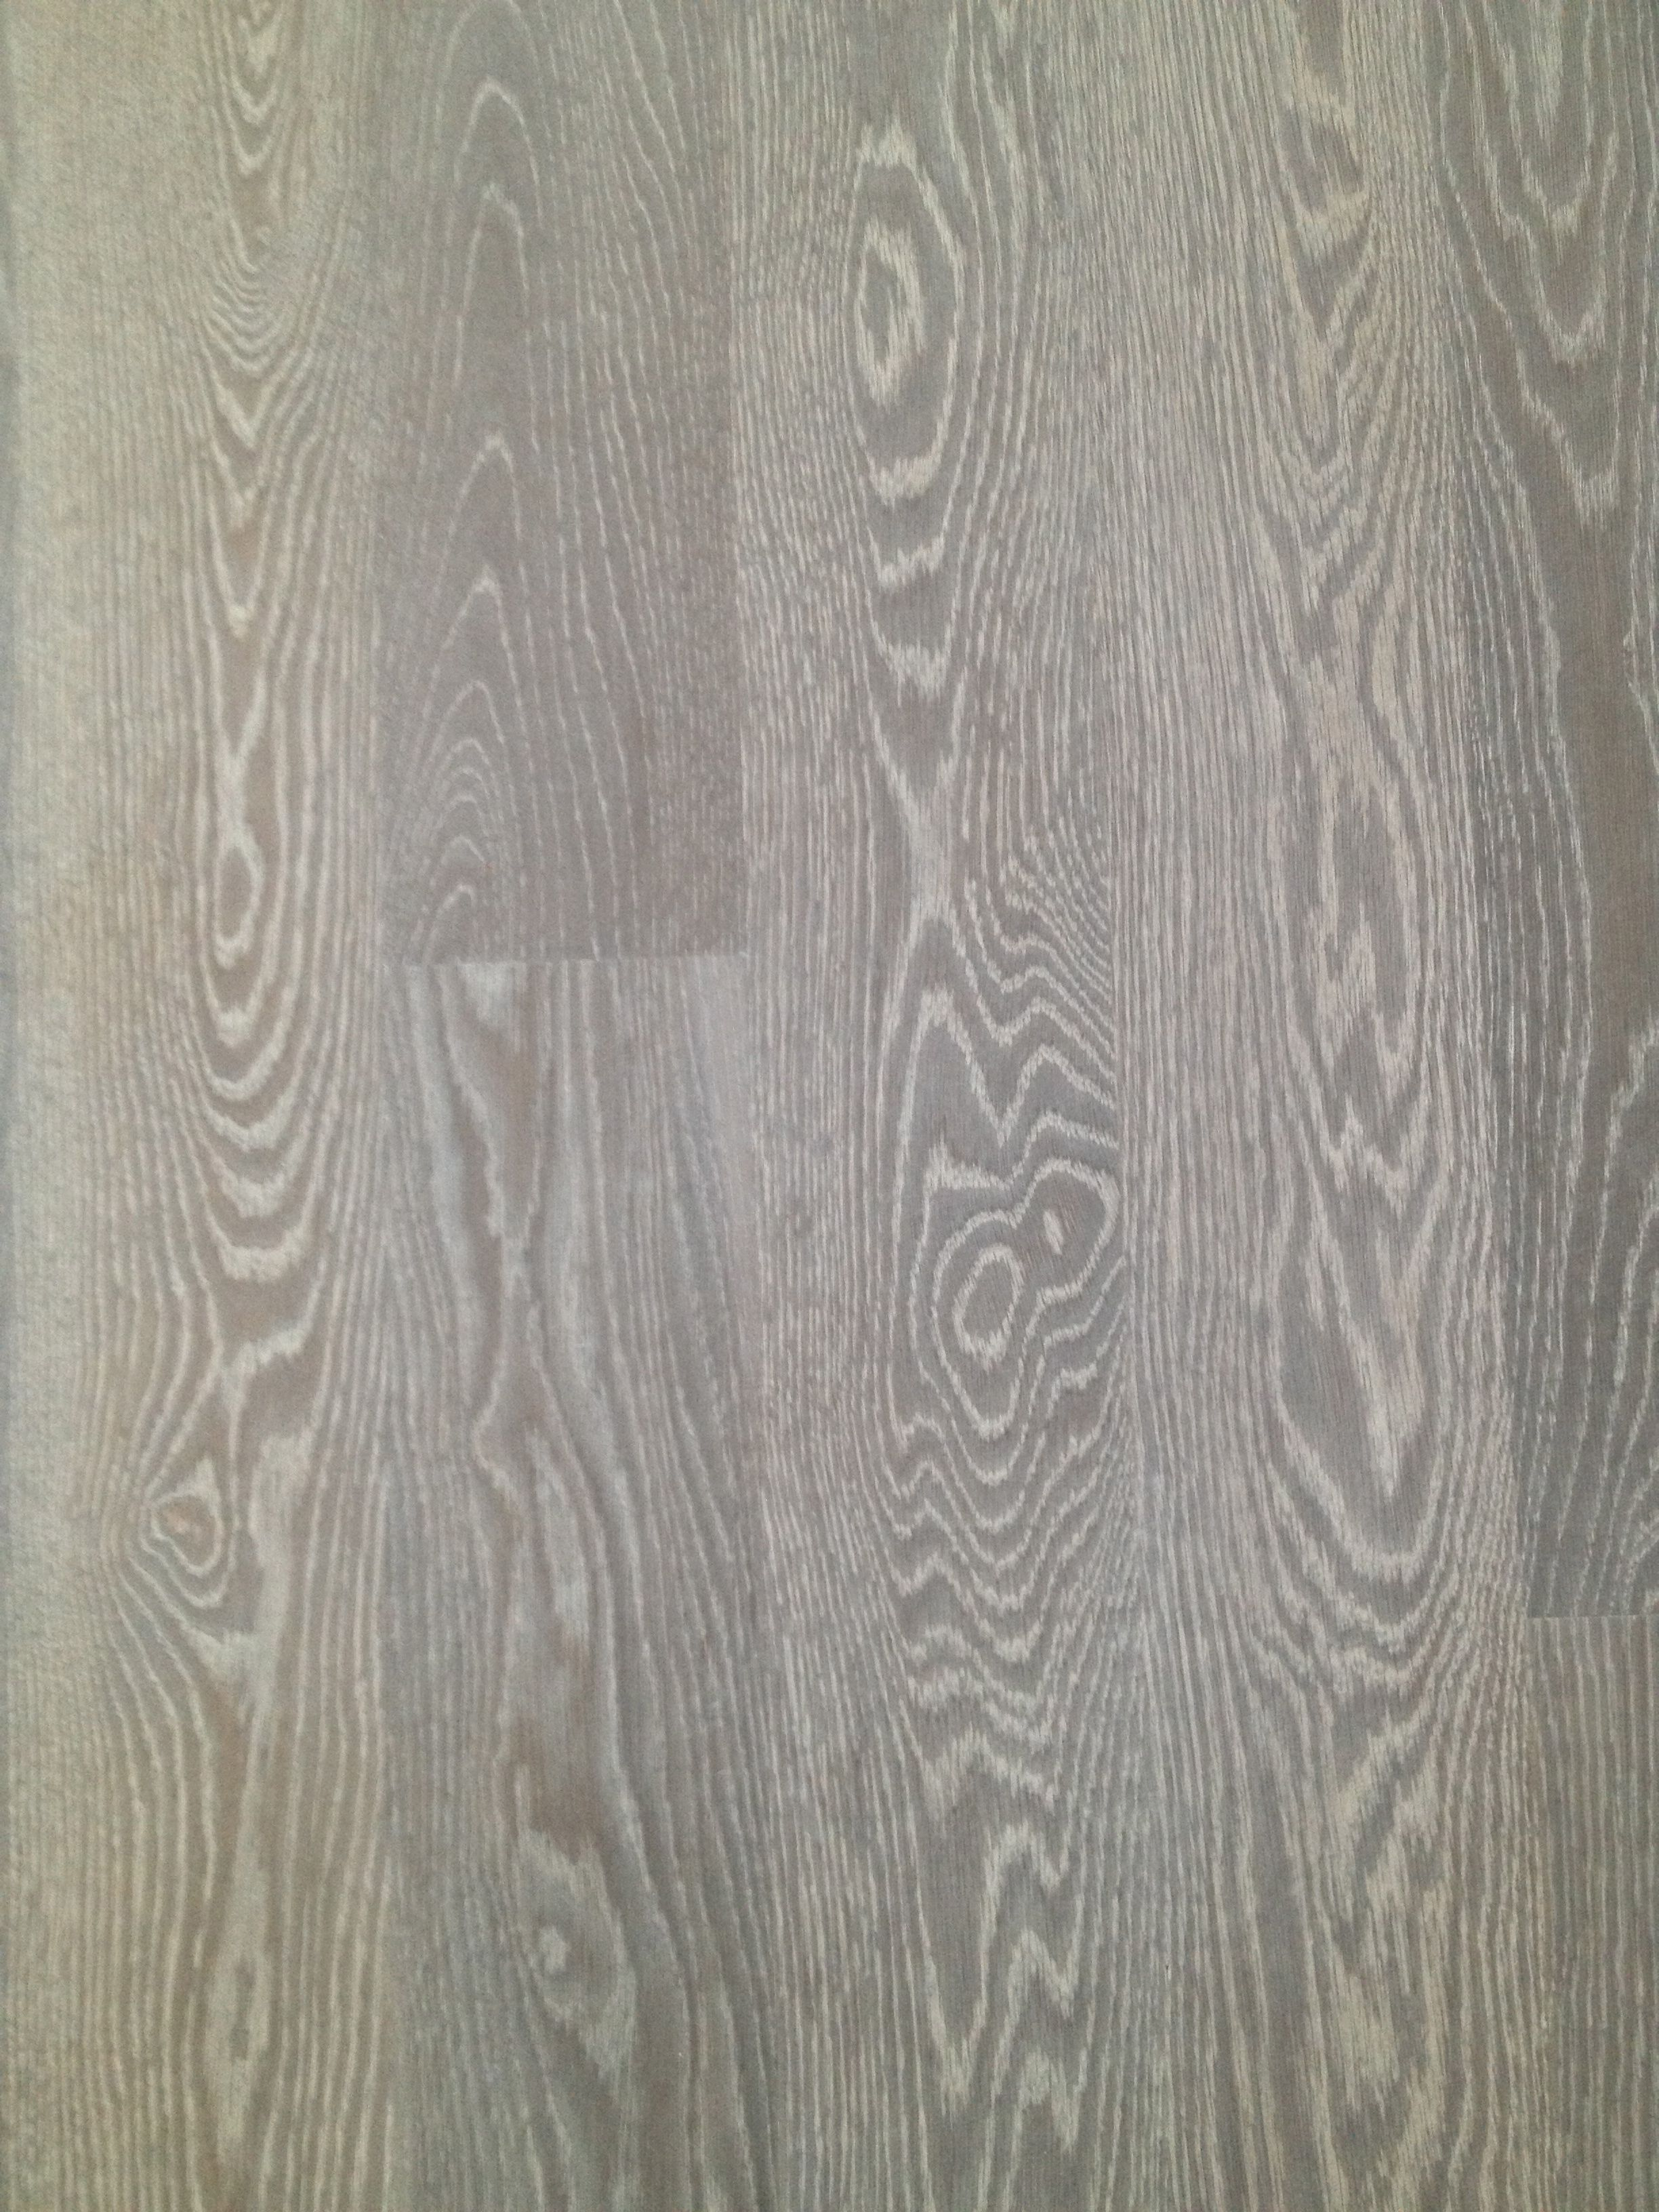 Rubio Monocoat Fumed Monocoat On Oak Floor Colors Oak